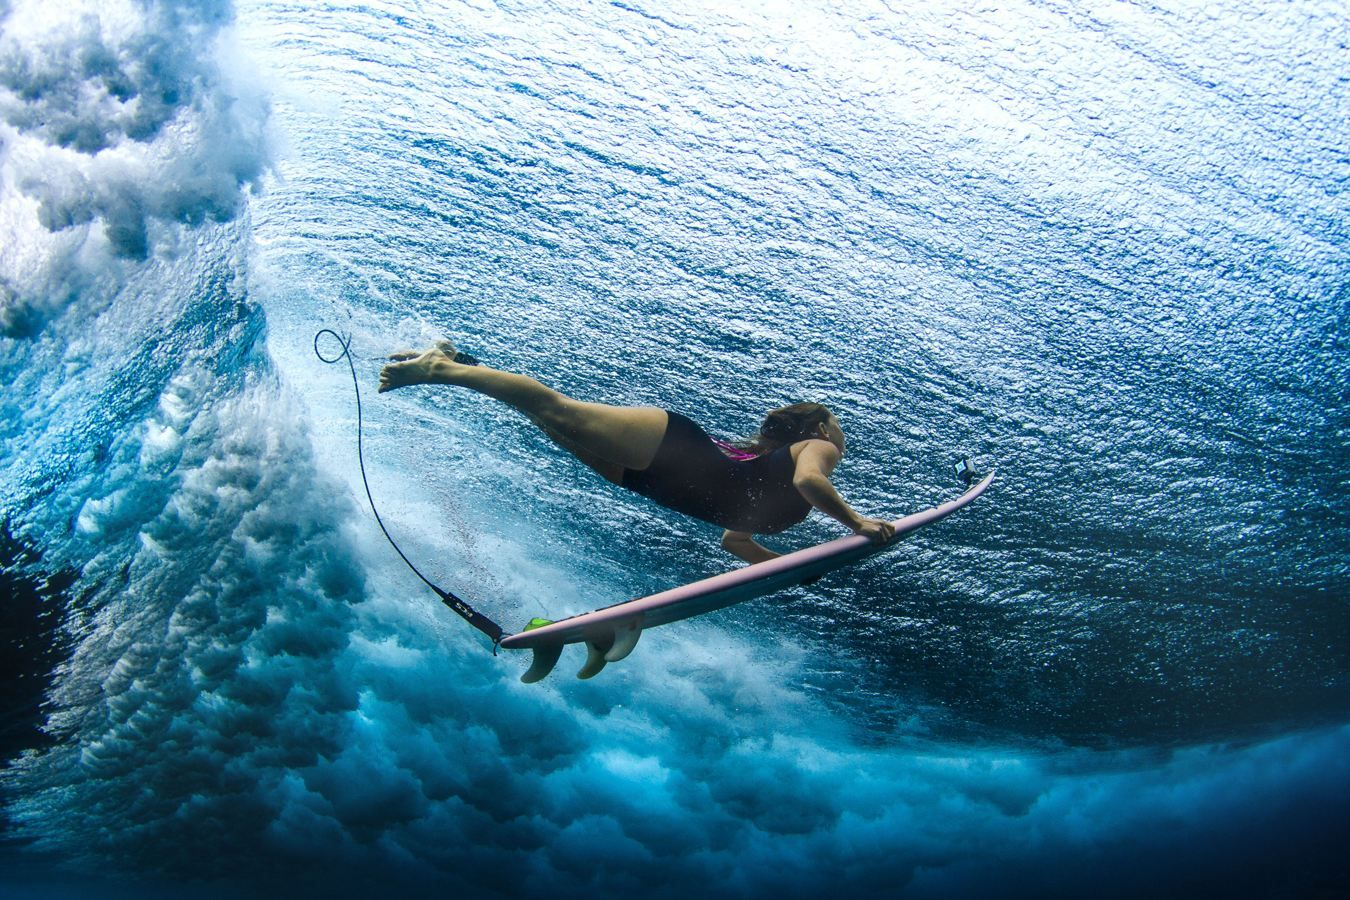 underwater surfer girl desktop - photo #20